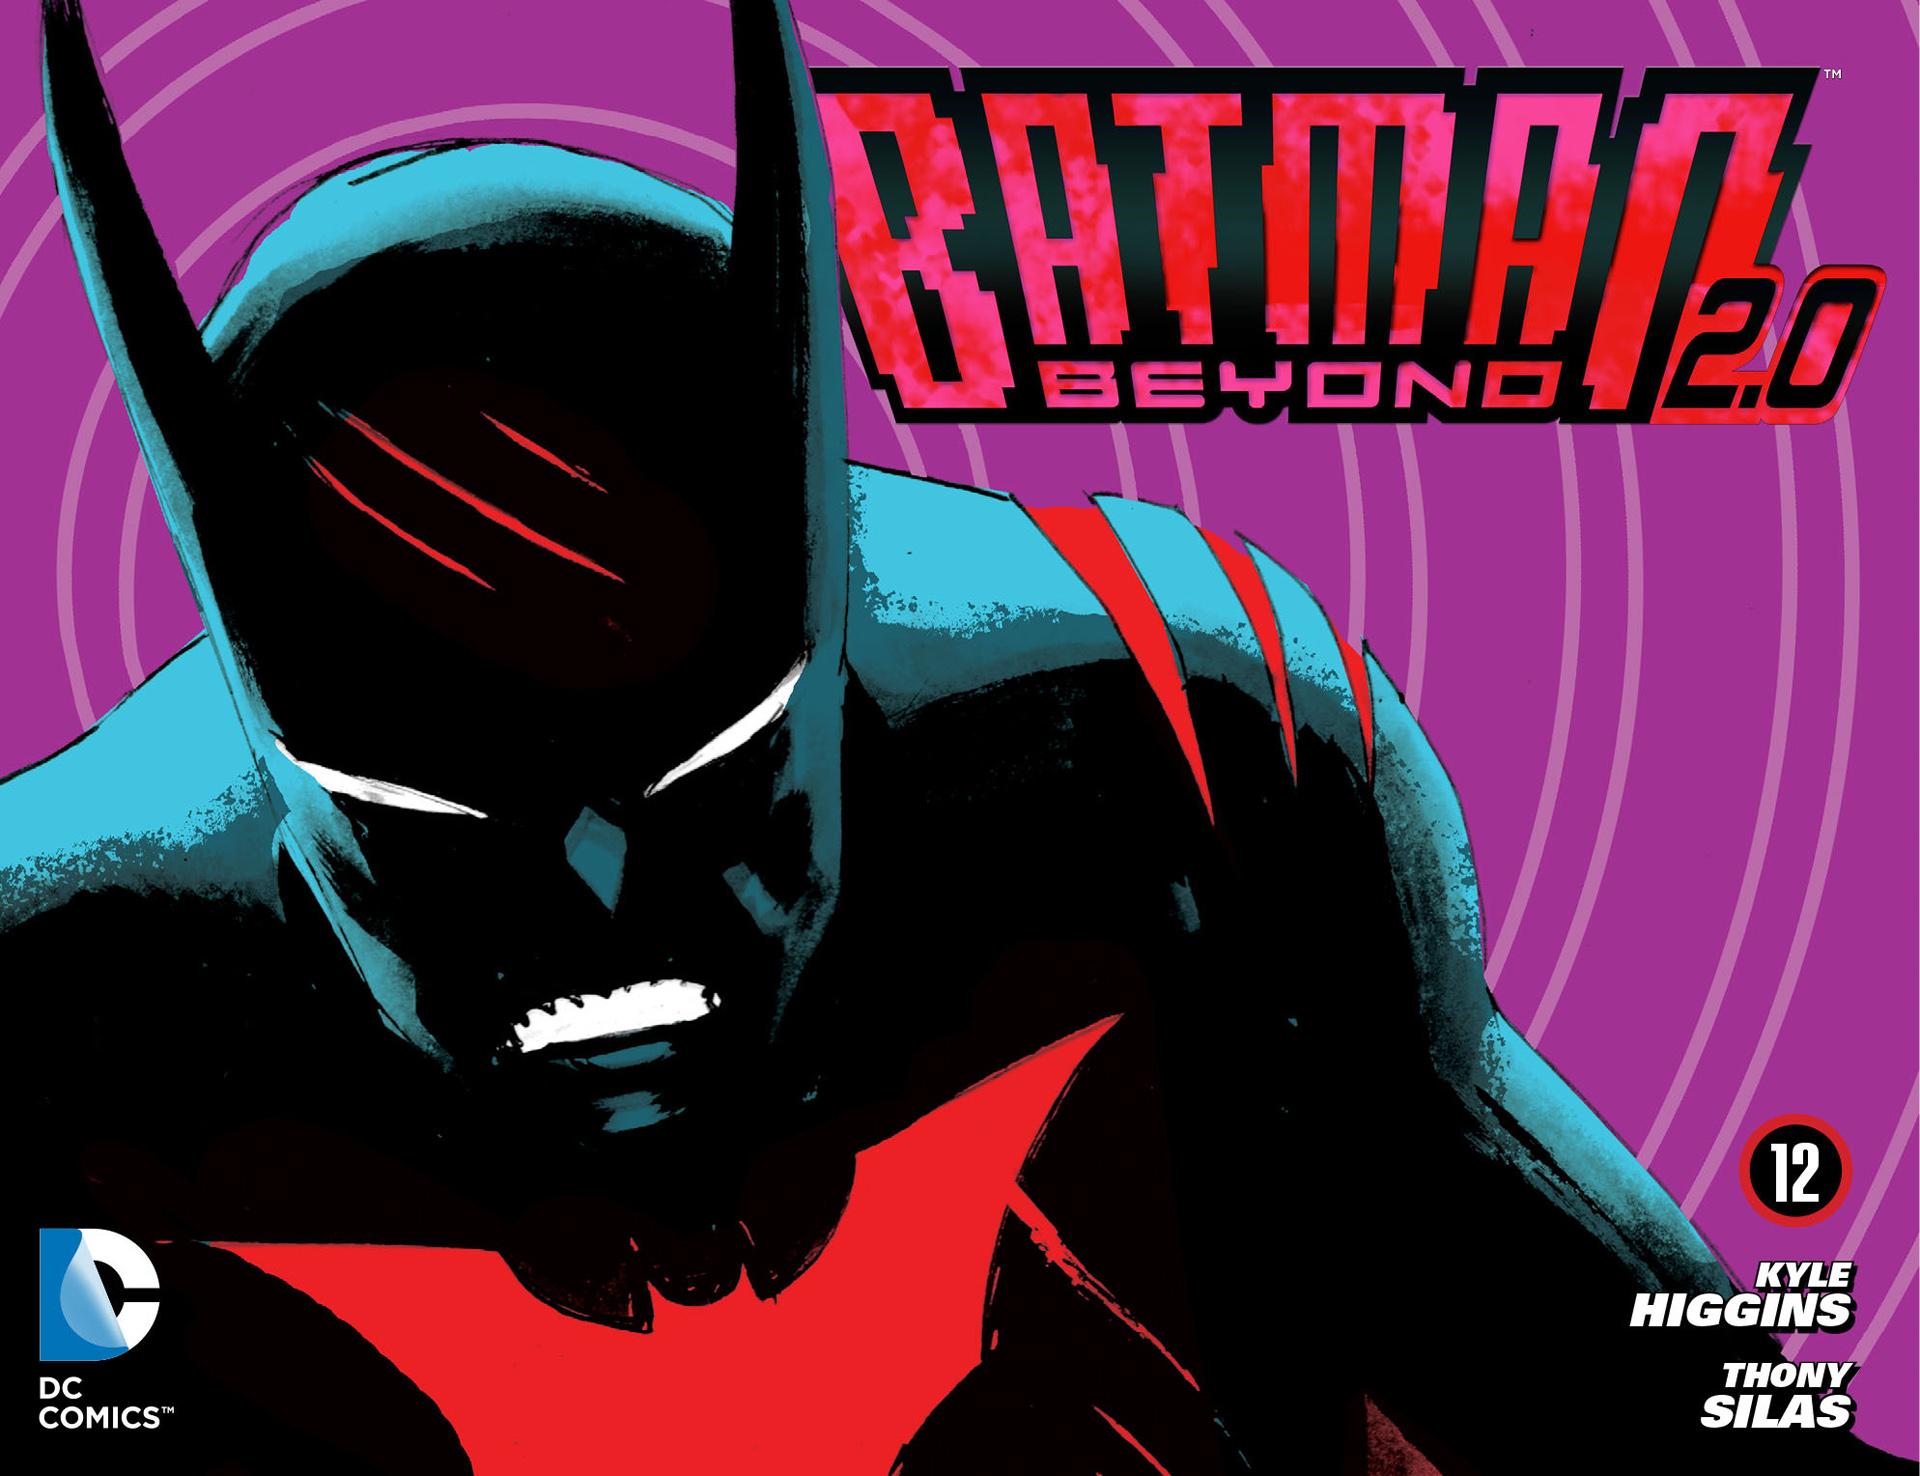 Batman Beyond 2.0 Issue #12 #12 - English 1